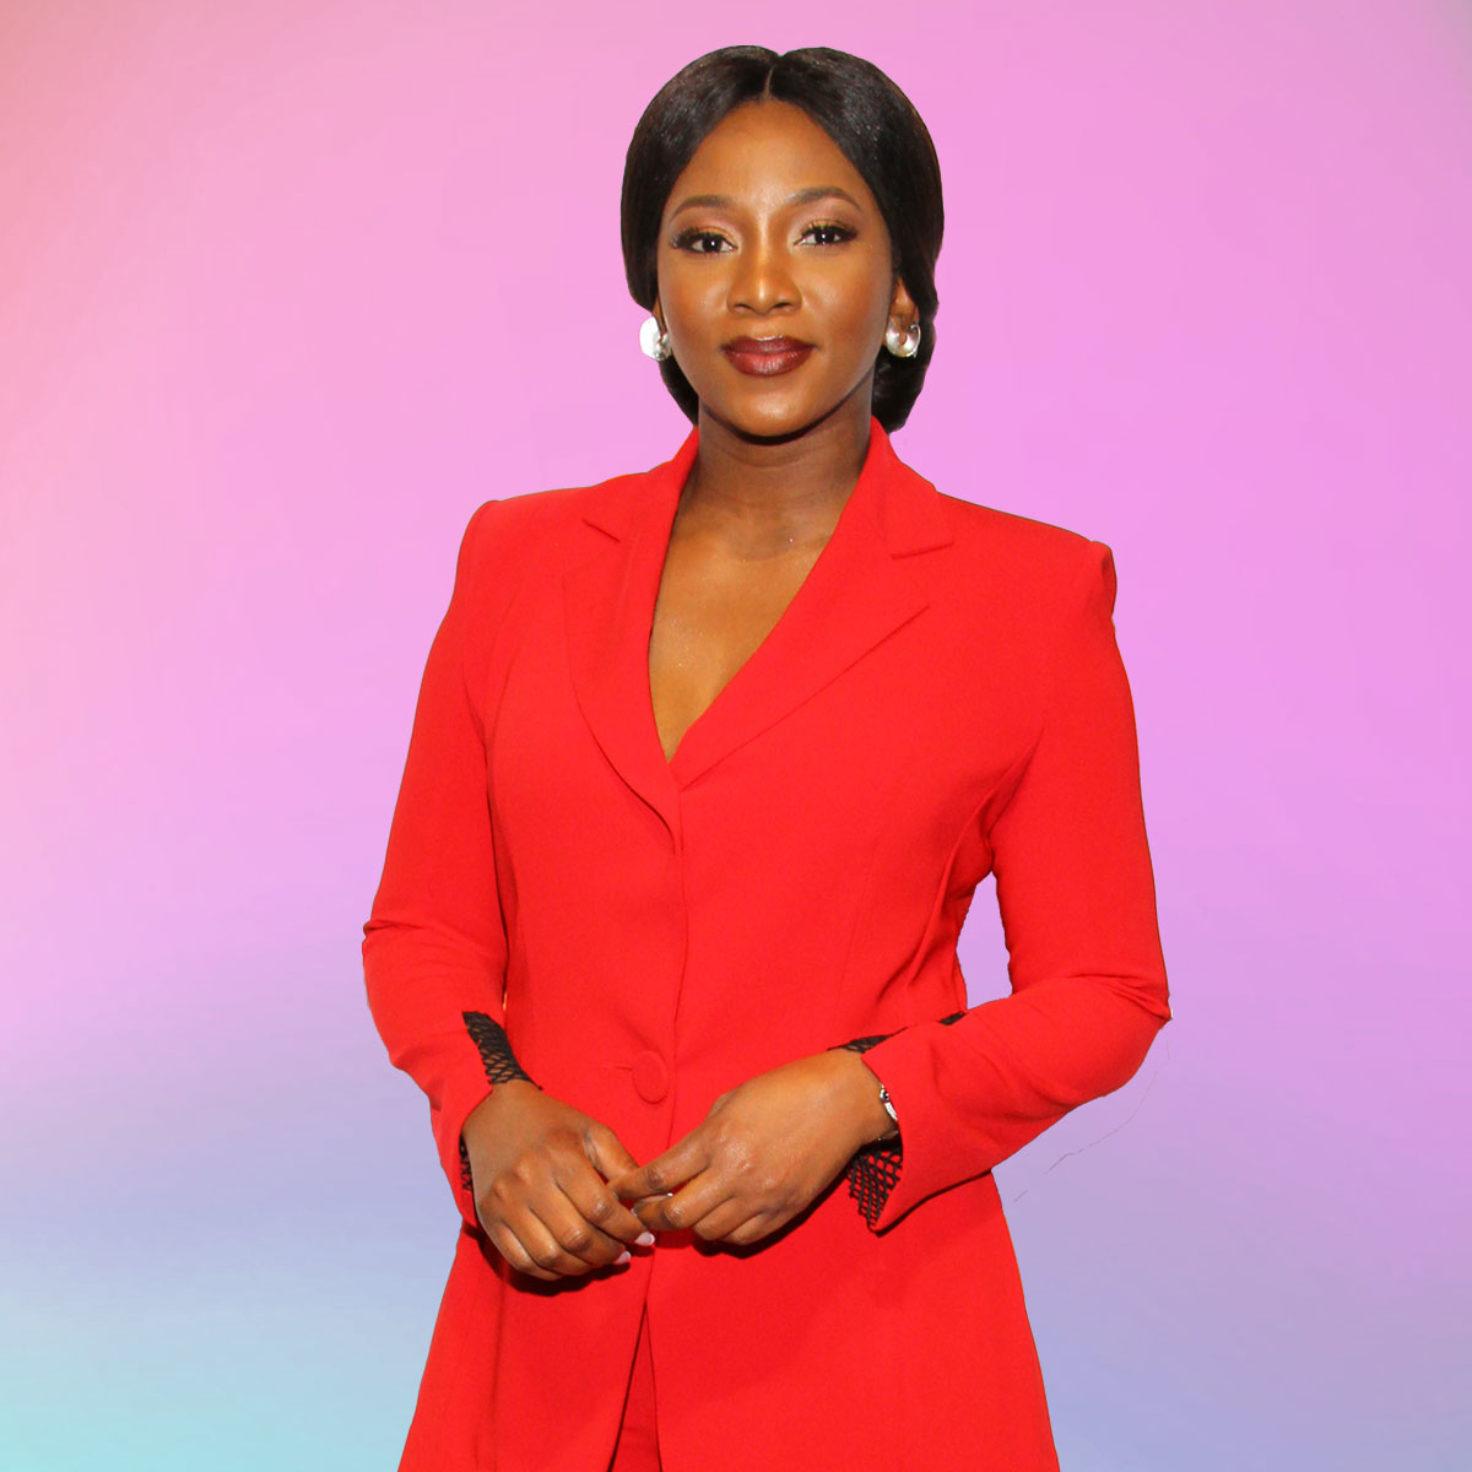 How old is Genevieve Nnaji?